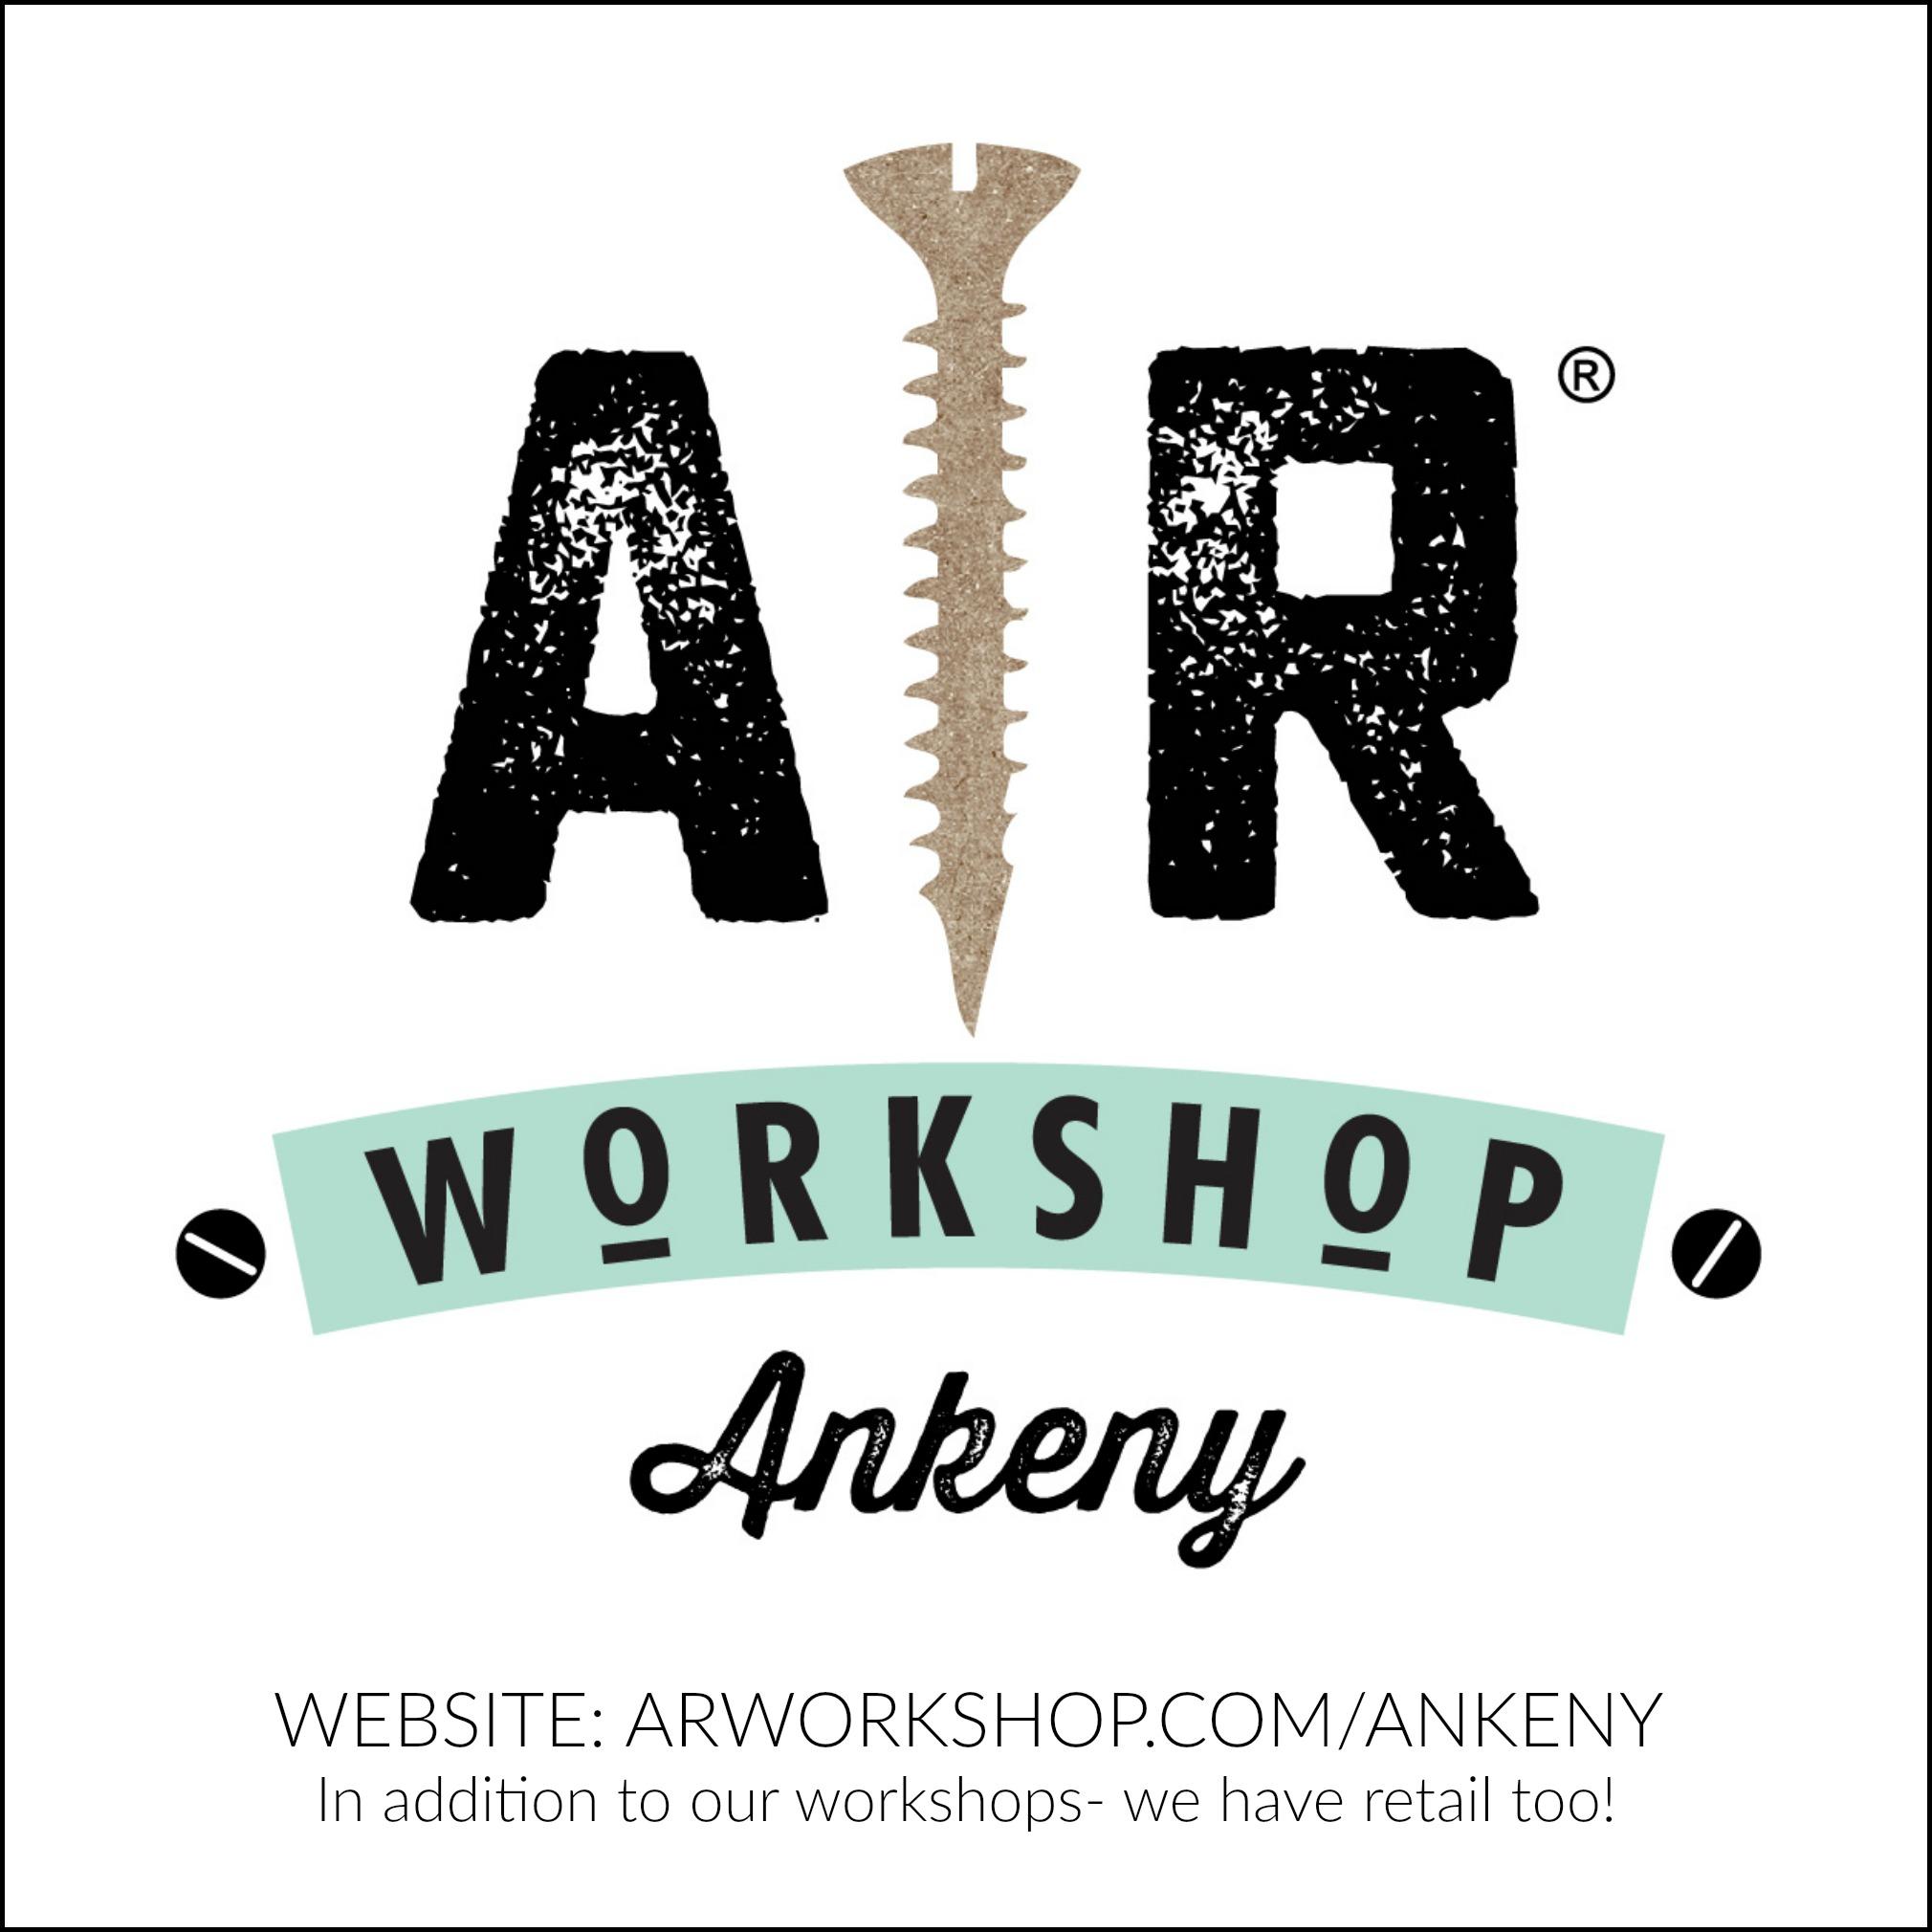 ArWorkshop Ankeny | ARWORKSHOP.COM/ANKENY